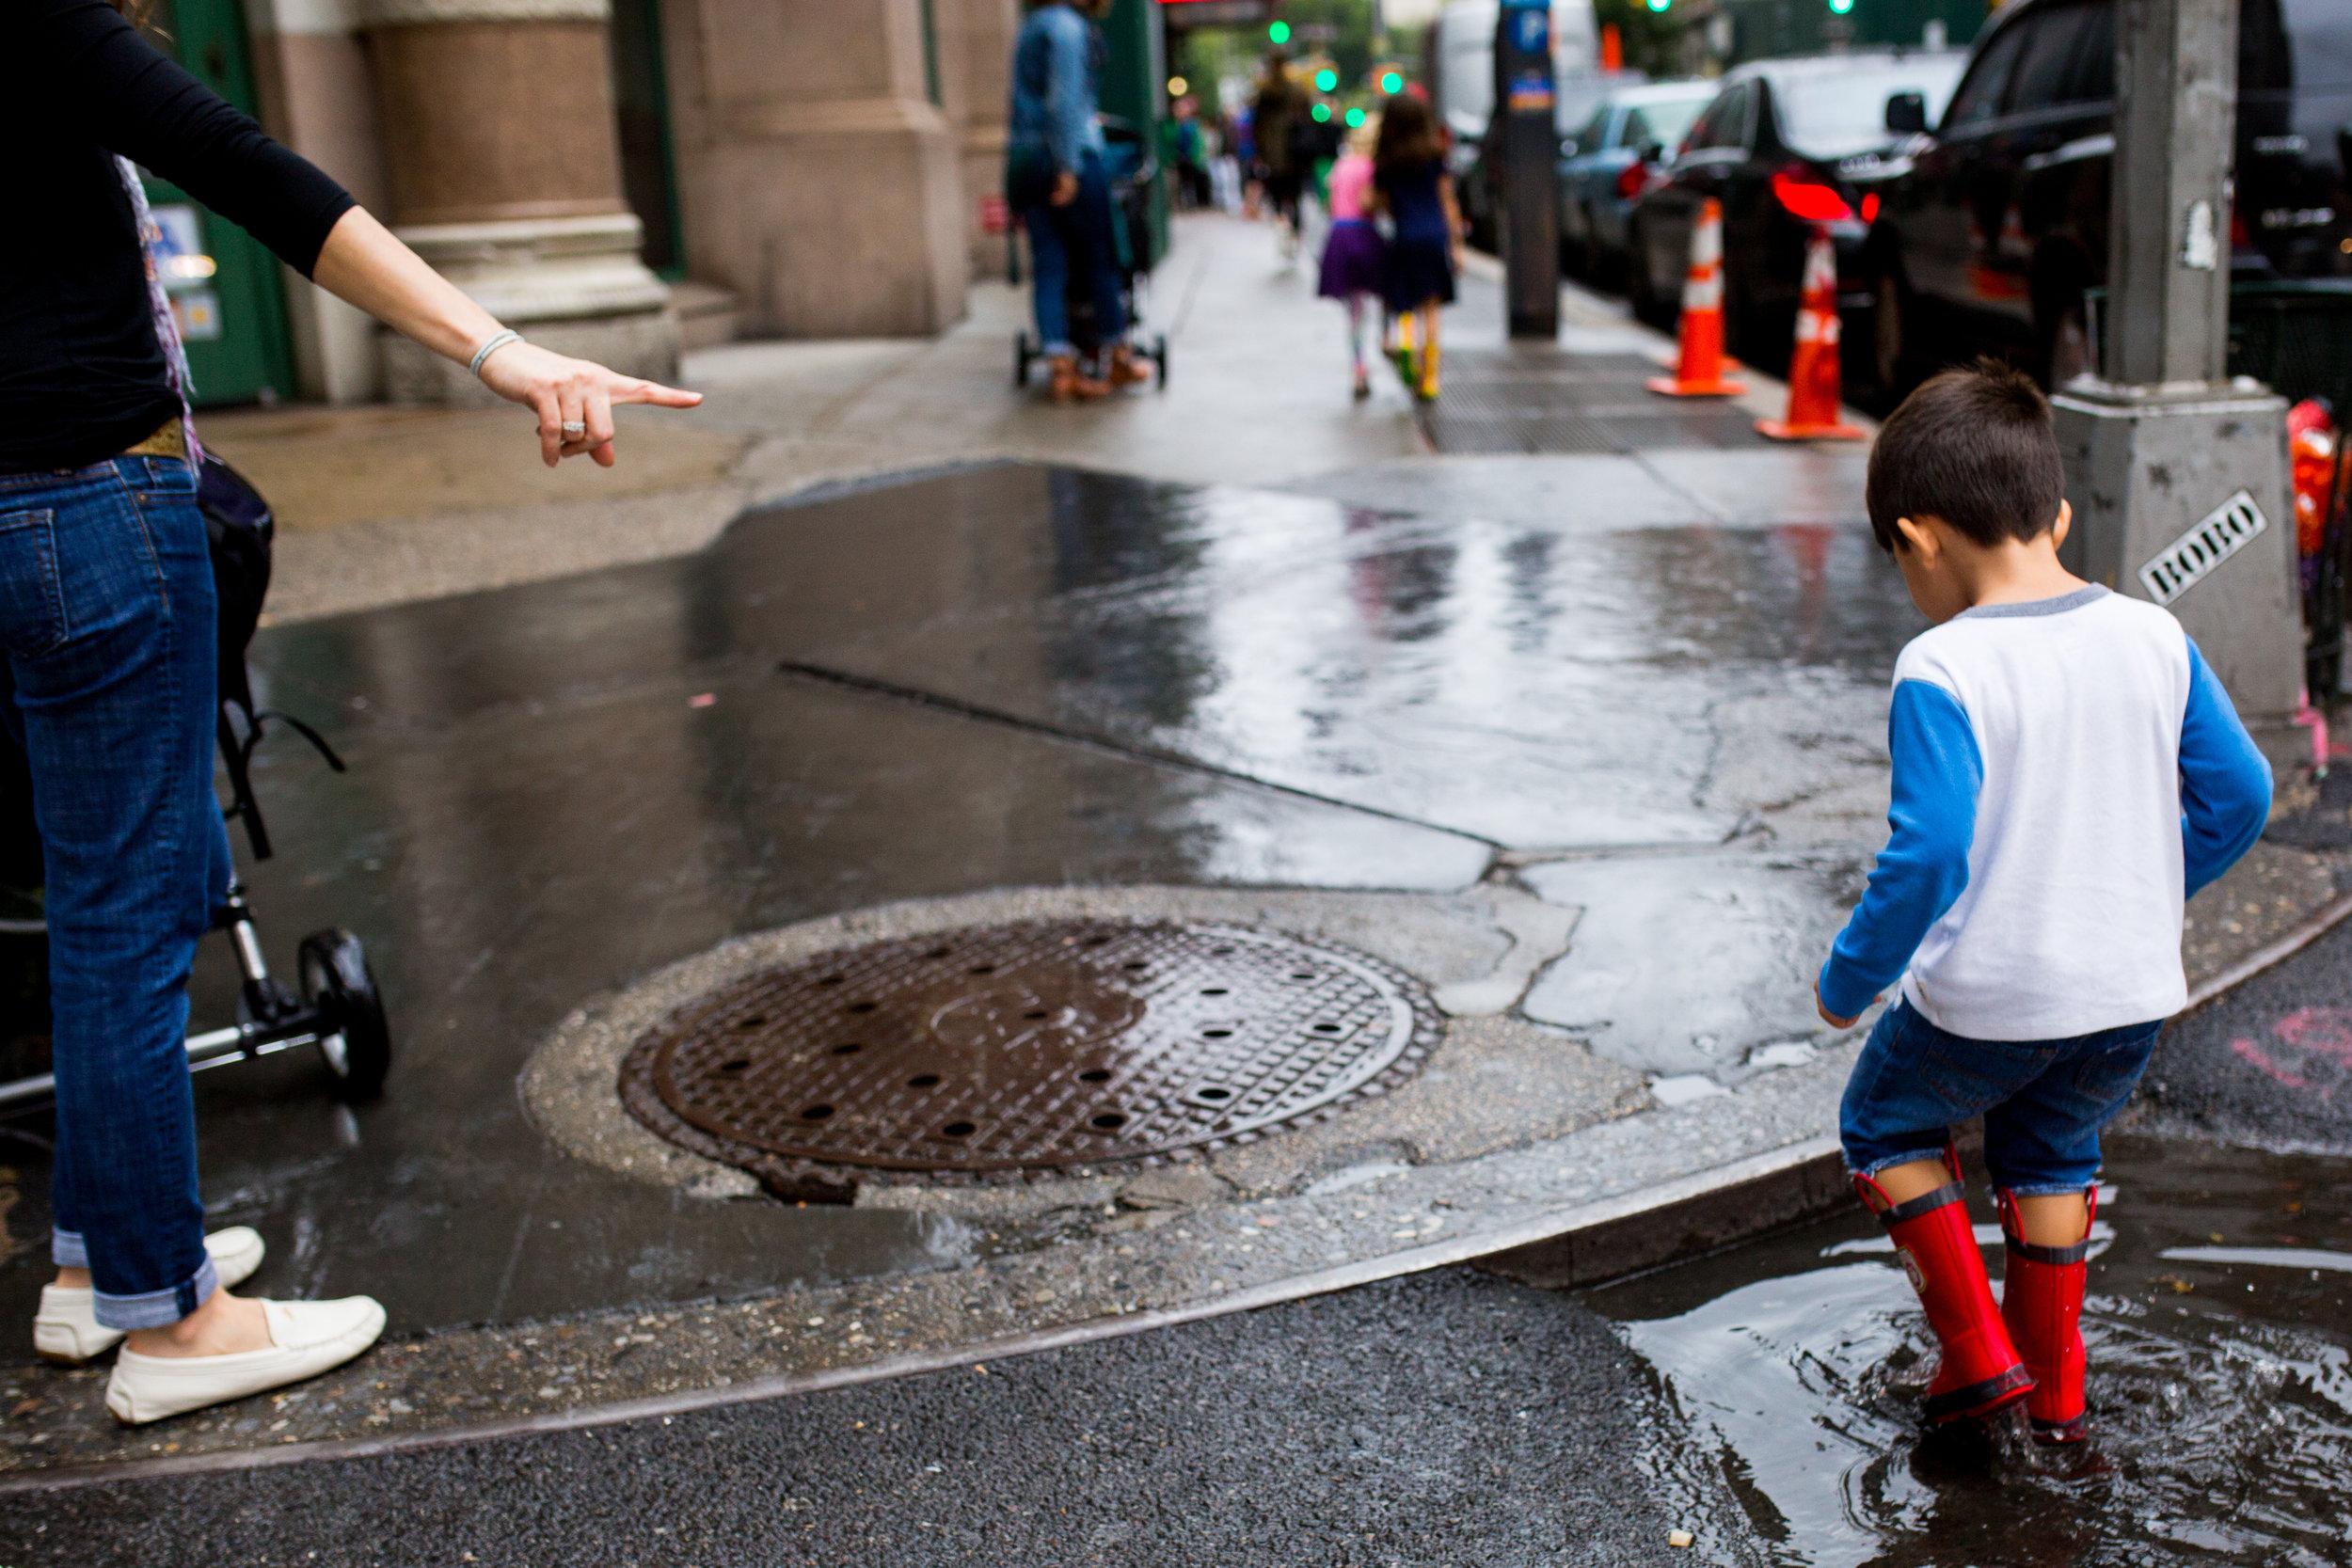 Boy in a rain puddle